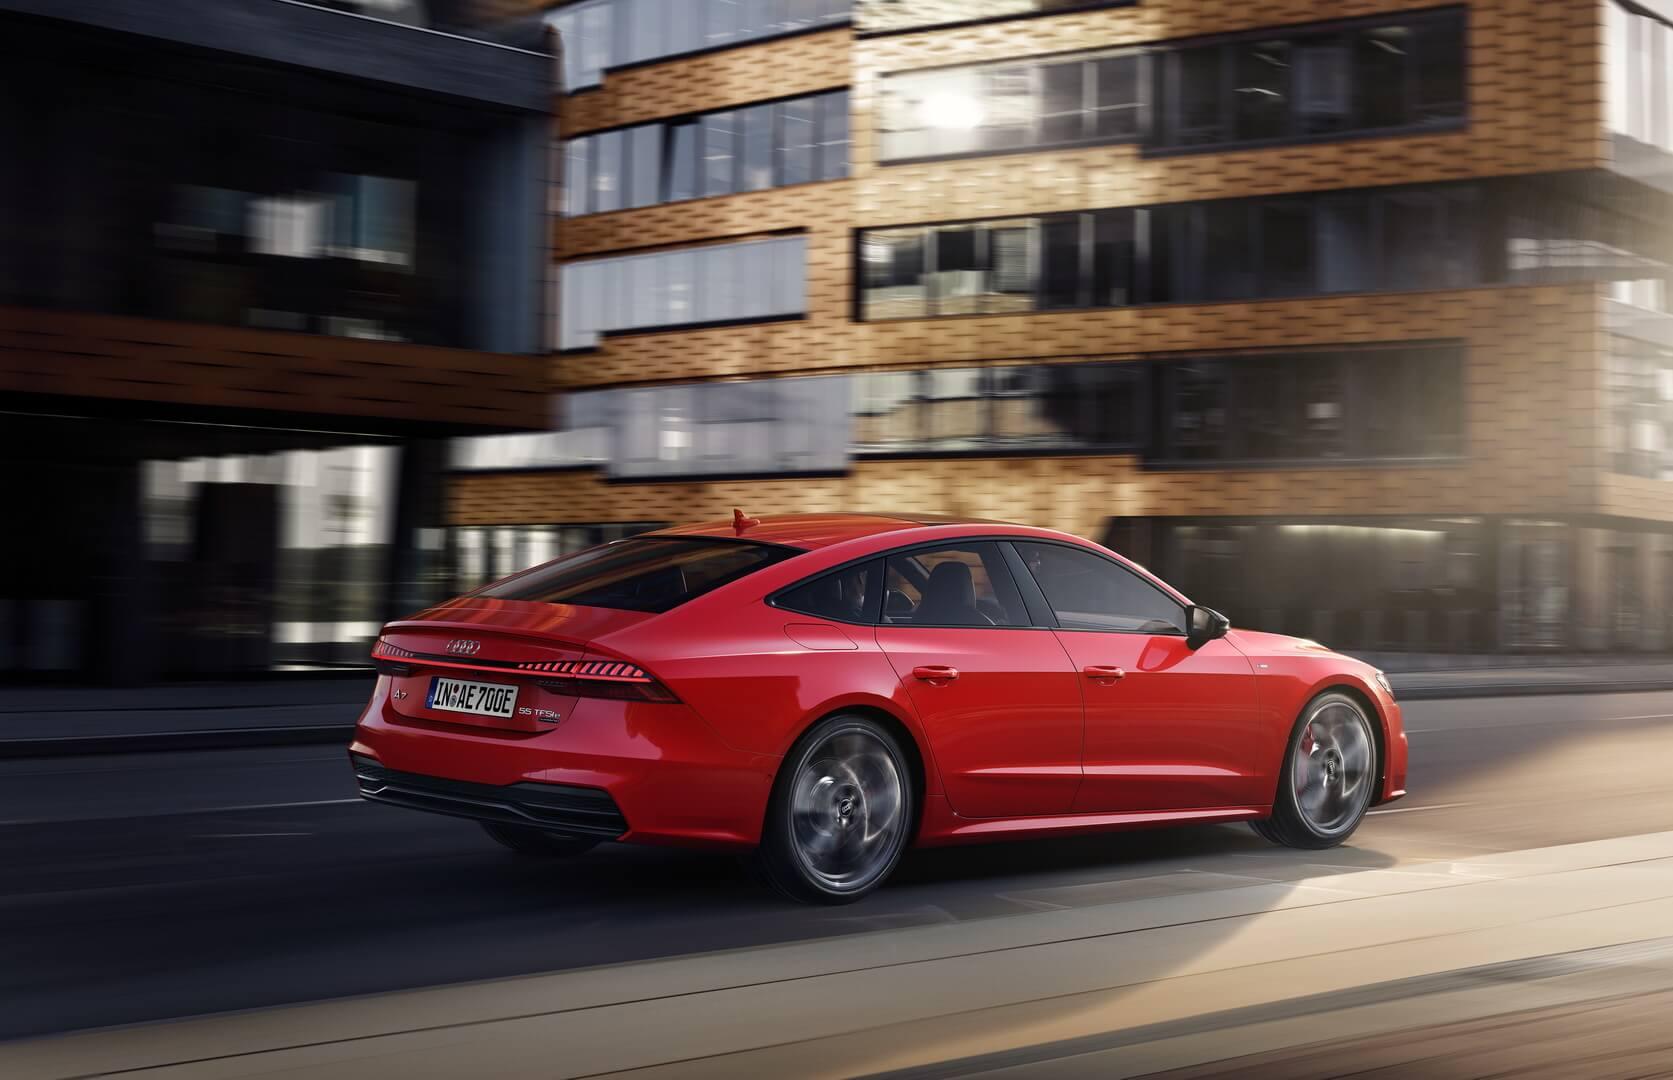 Плагин-гибридное купе Audi A7 Sportback 55 TFSI e quattro